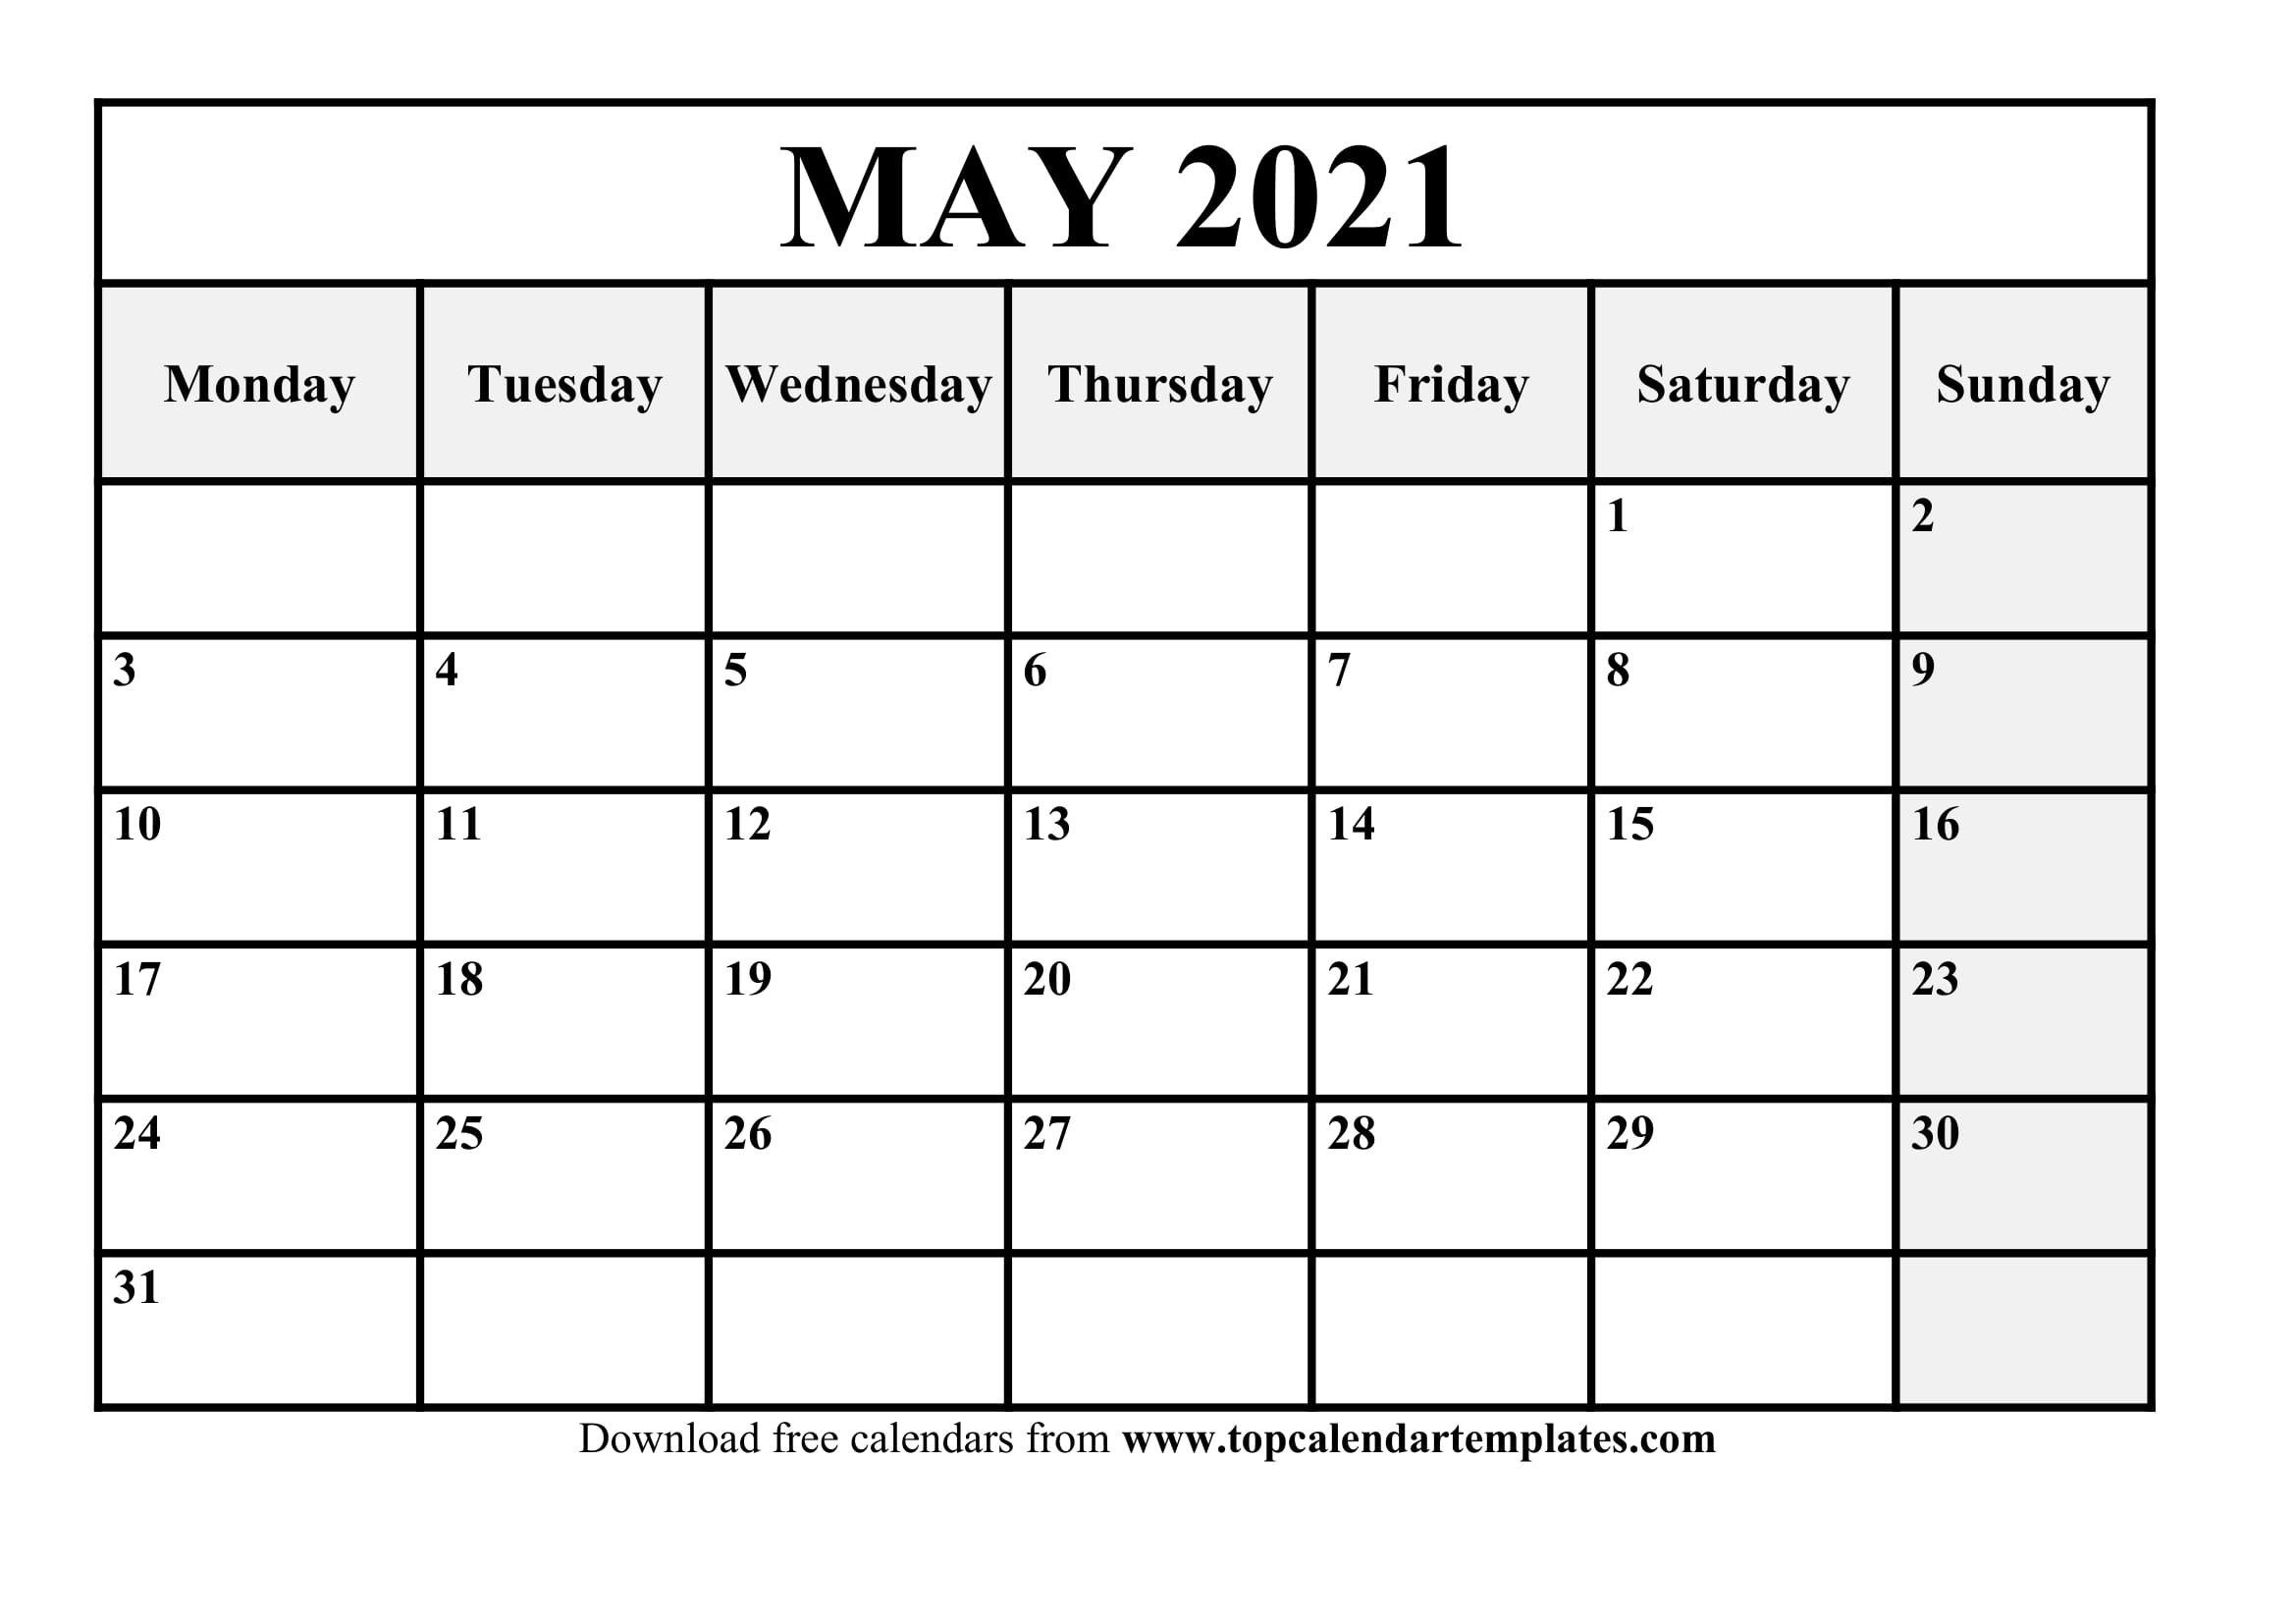 Free May 2021 Calendar Printable (Pdf, Word) Templates pertaining to Free Printable Calendar 2021 Daily Graphics